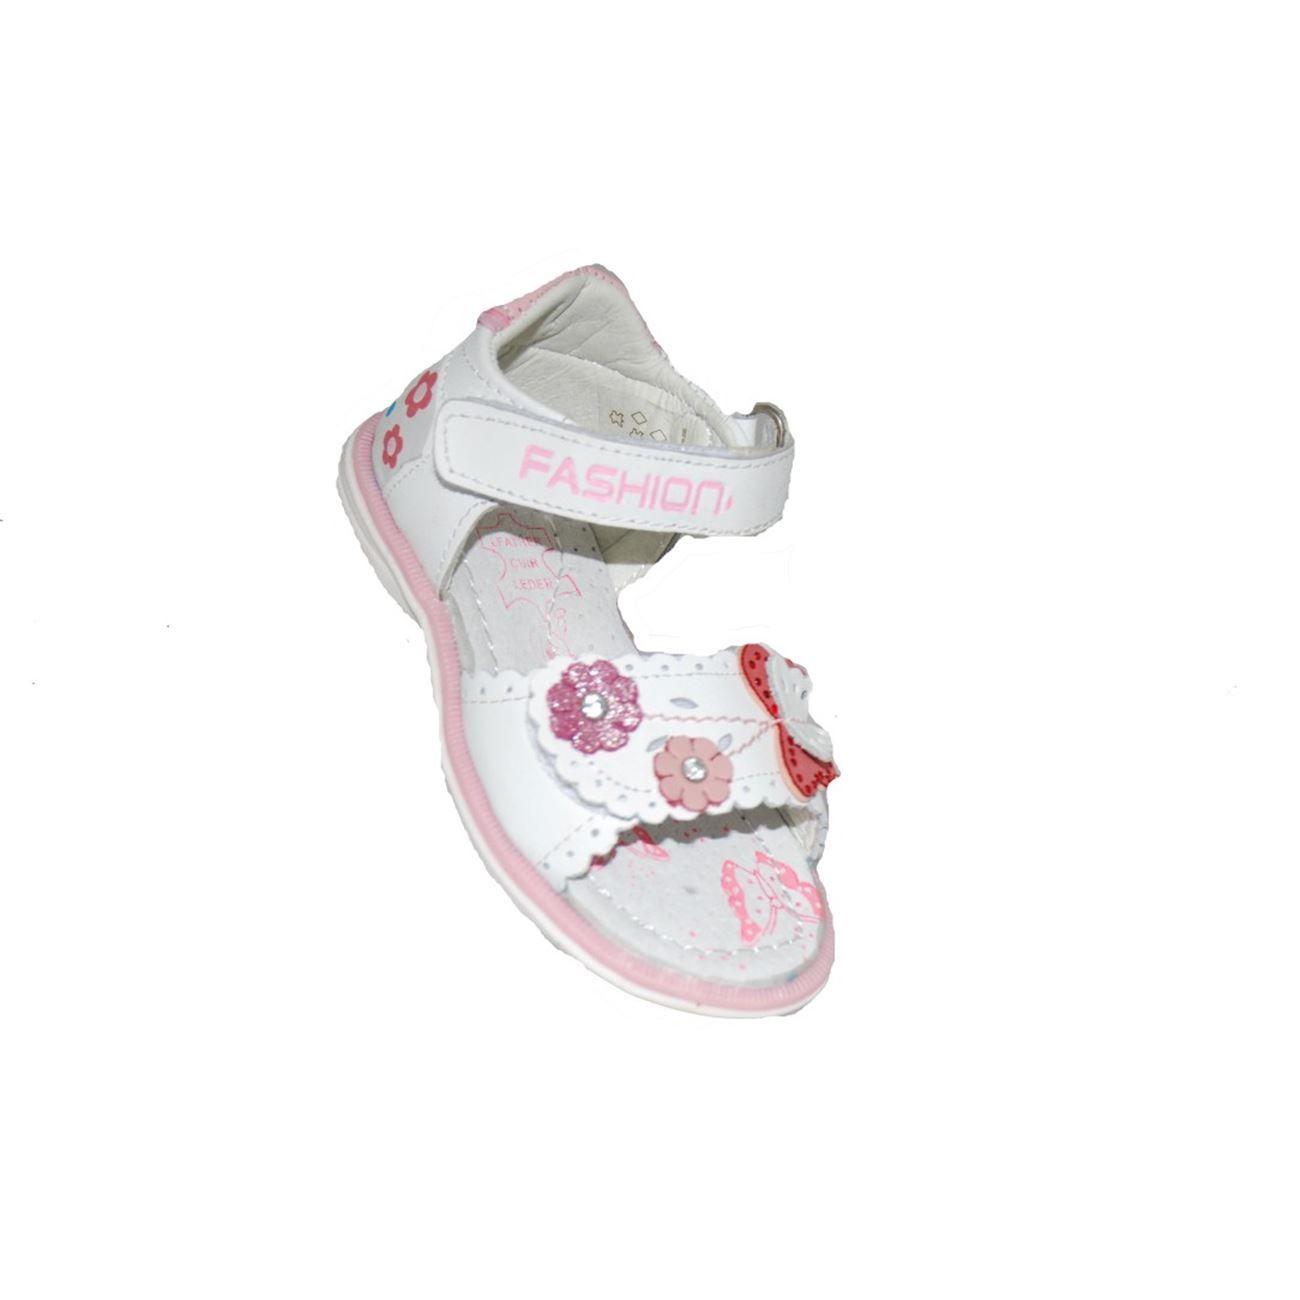 4b76e395d76 Μποτάκι πρώτα βήματα δερμάτινο-σαμουά ροζ, δερμάτινο ανατομικό πέλμα,  φερμουάρ στο πλάι και δέσιμο με κορδόνια, σχέδιο με τρουκ, GE… | Wish I had  them!